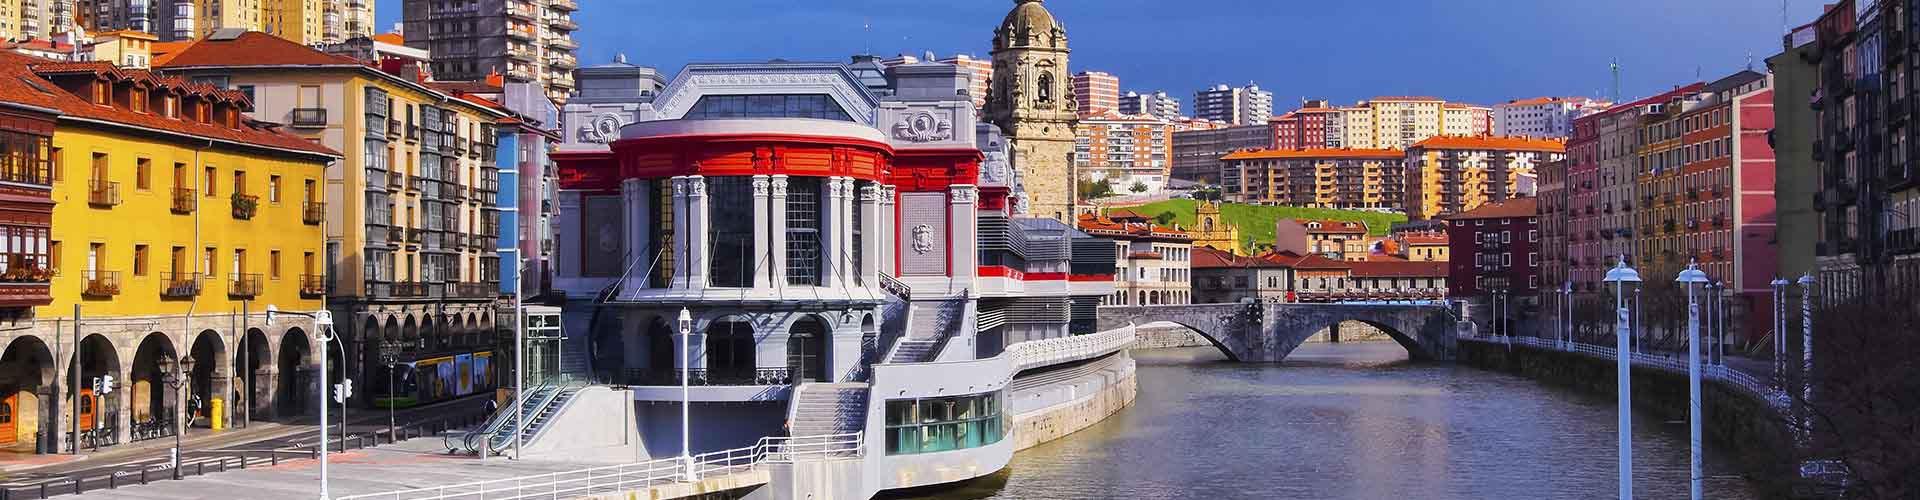 Bilbao - Alberghi a Bilbao. Mappe per Bilbao, Foto e  Recensioni per ogni Albergo a Bilbao.